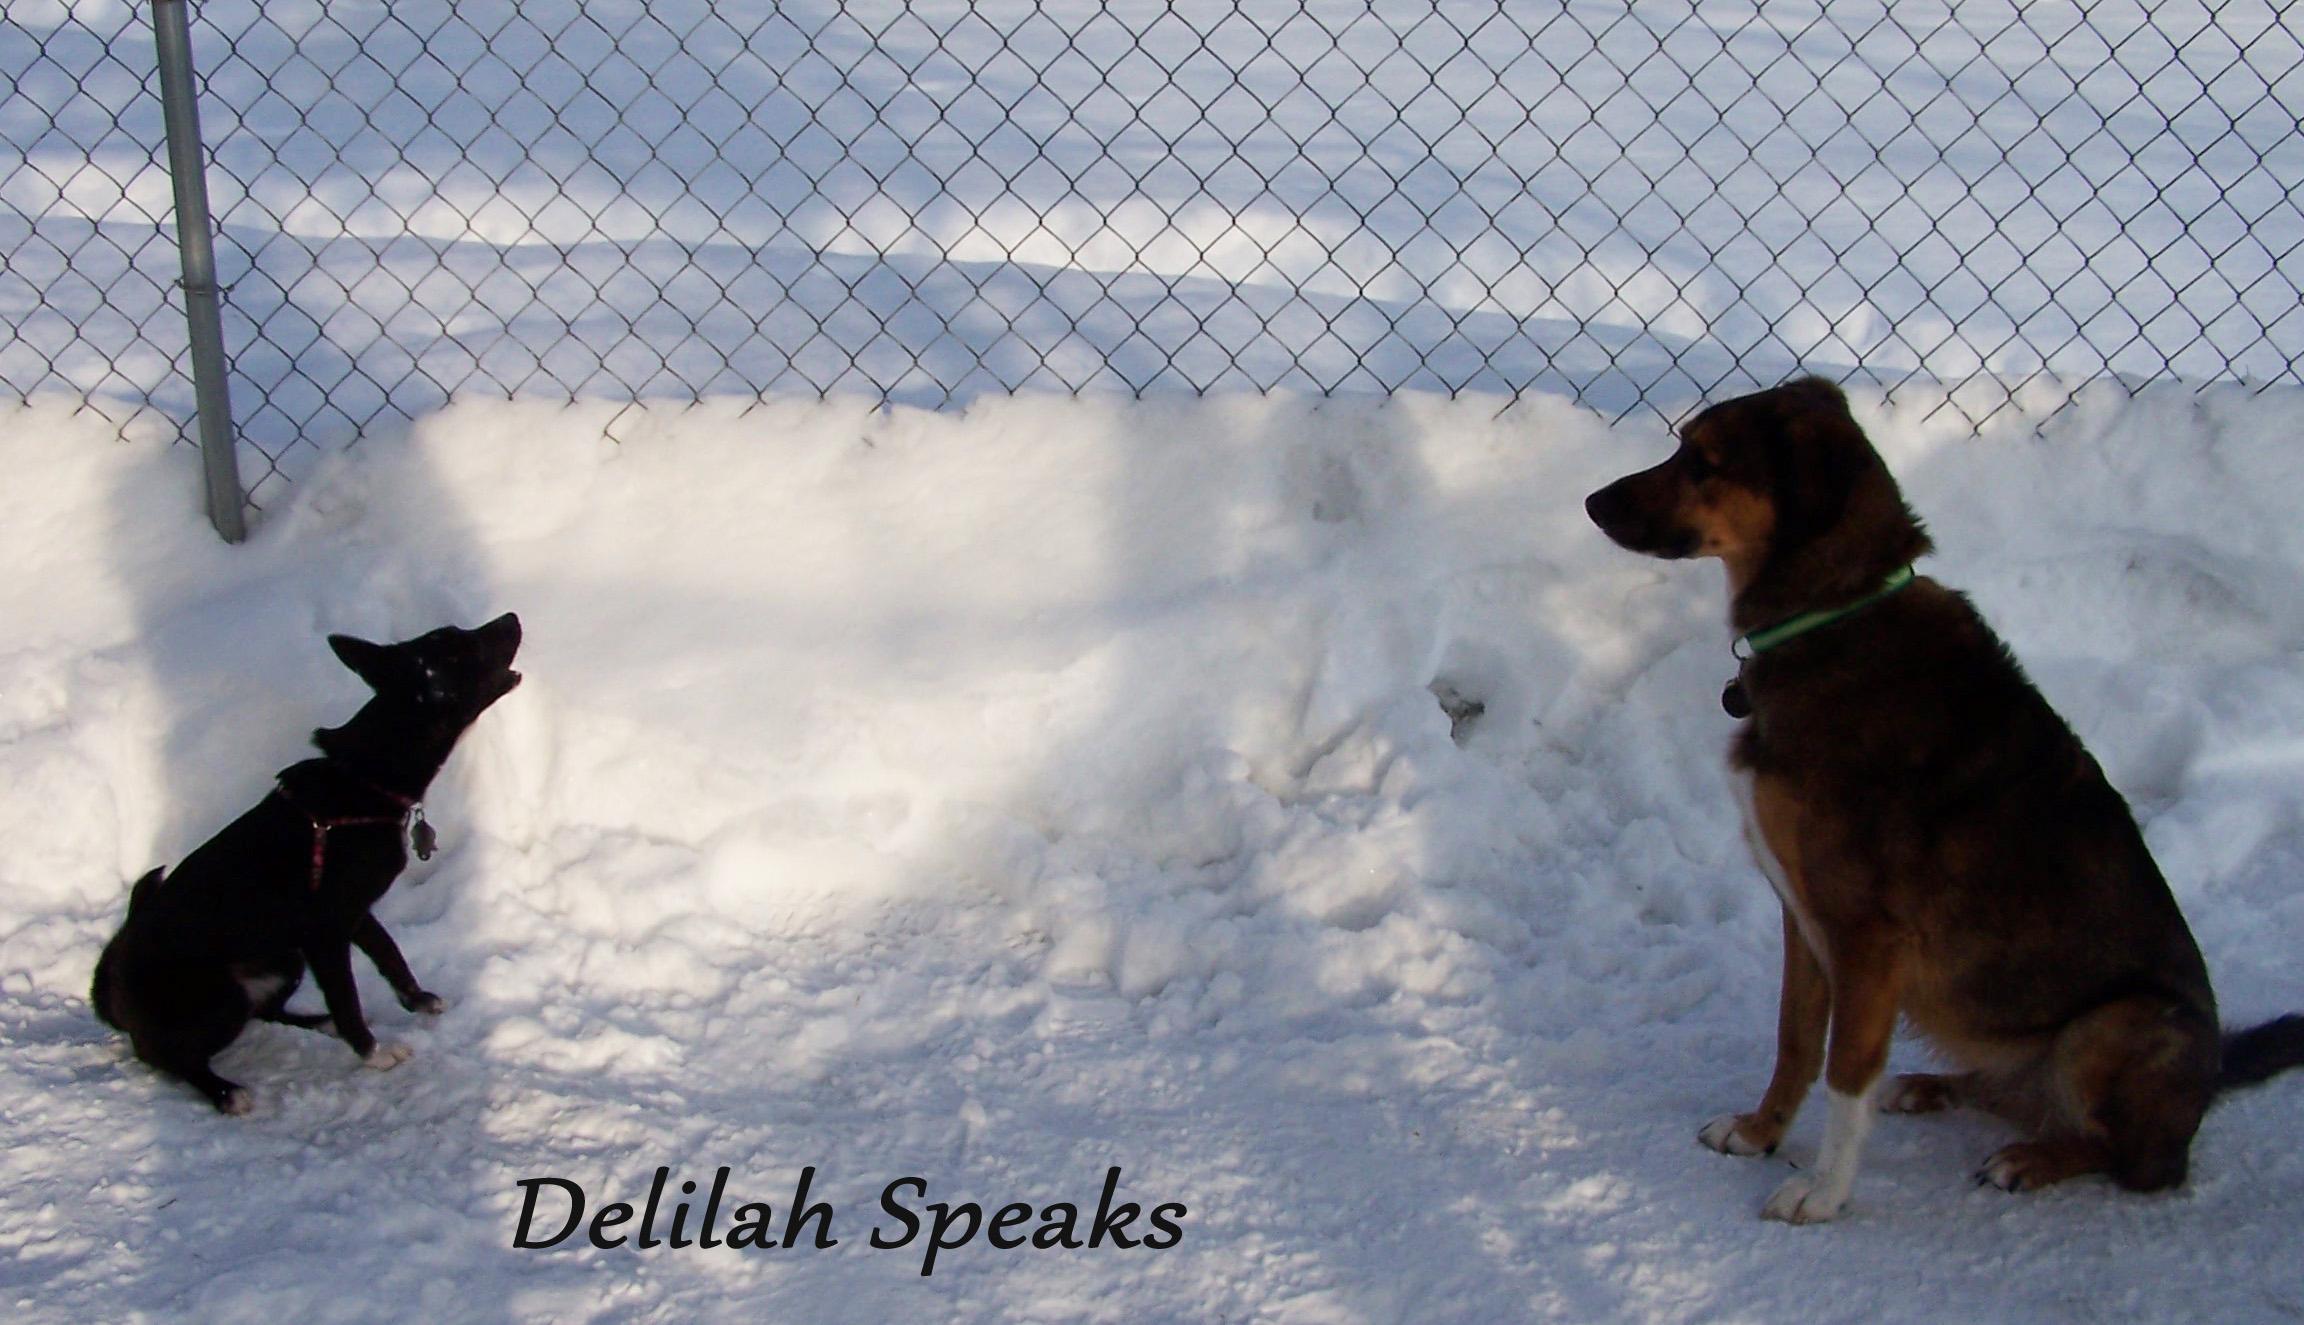 delilah speaks